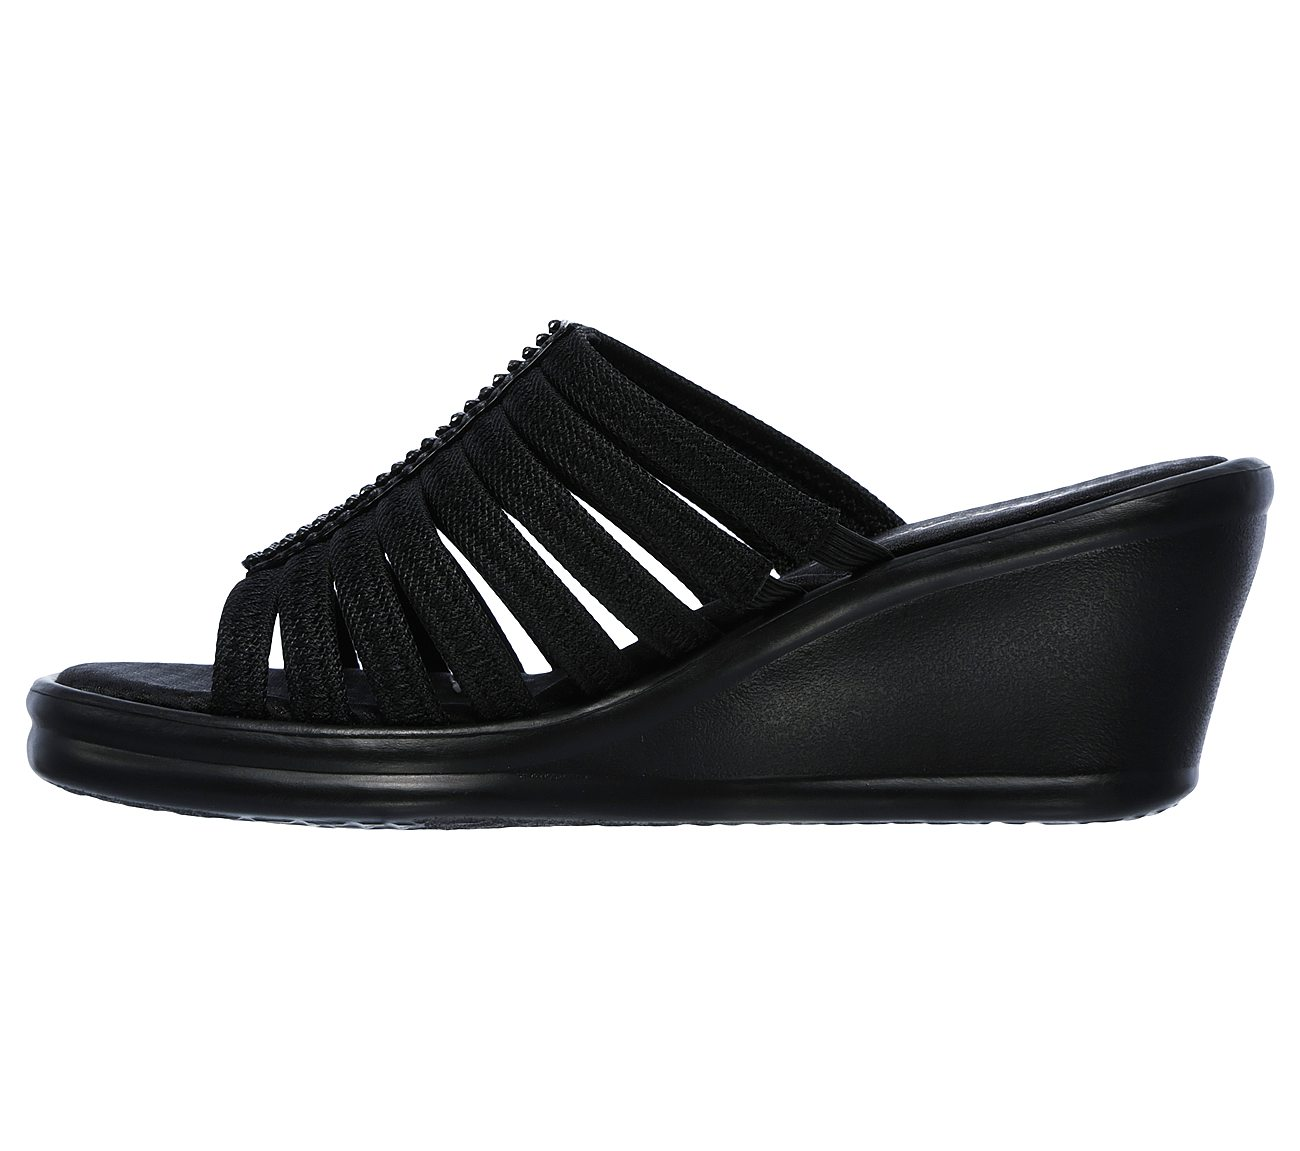 6741f5d2e2a1 Buy SKECHERS Rumblers - Hotshot Cali Shoes only  47.00